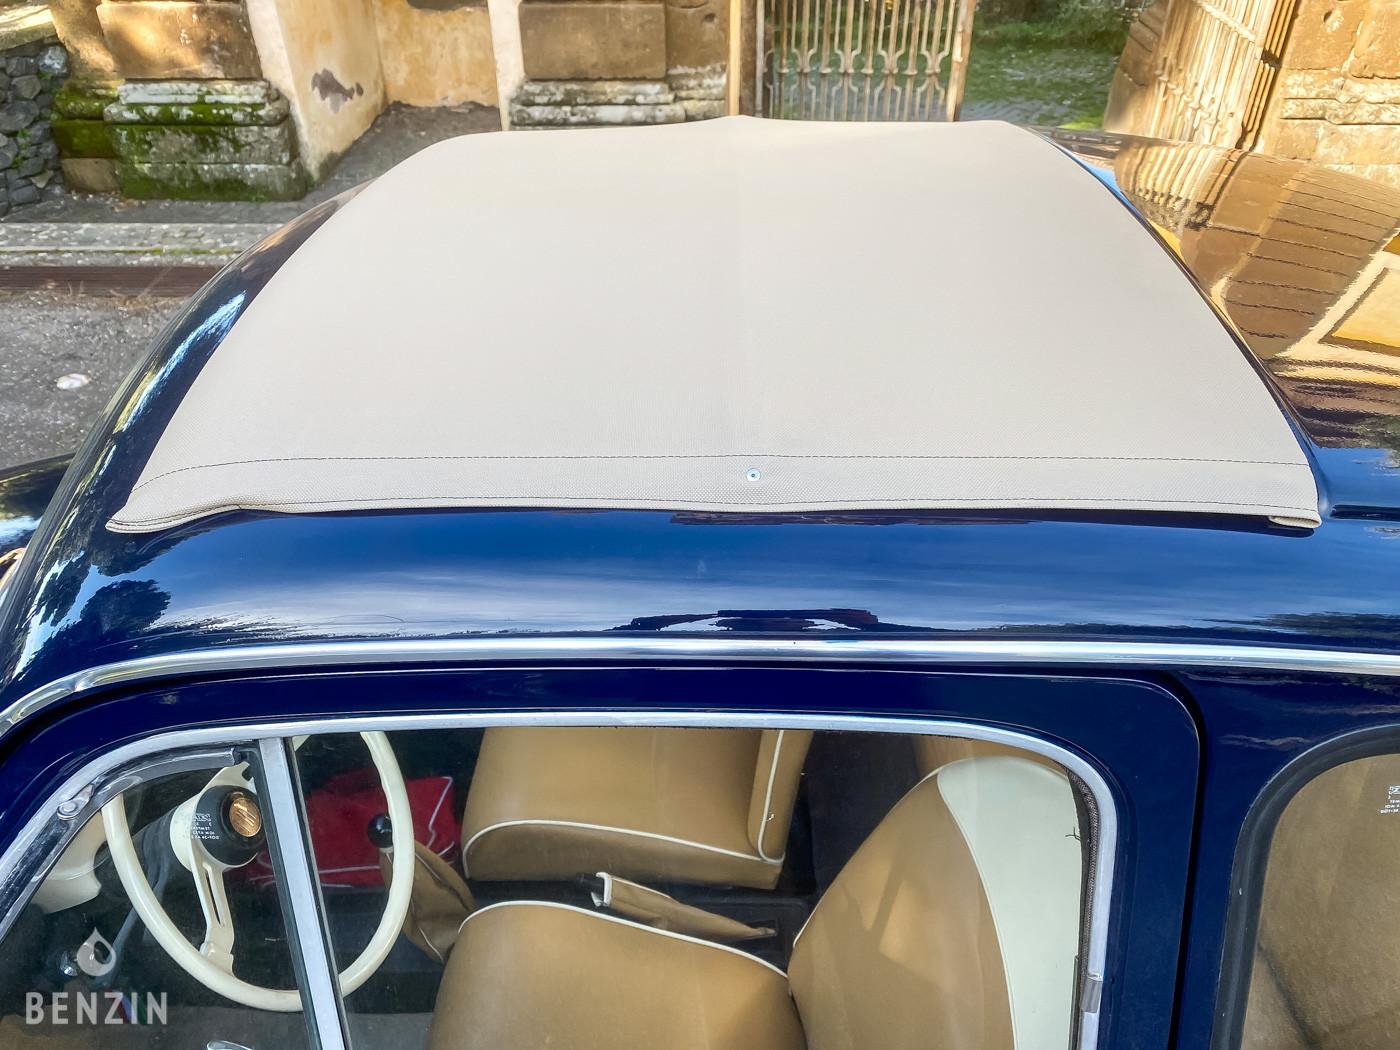 FIAT 500 F A VENDRE FOR SALE EN VENDITA